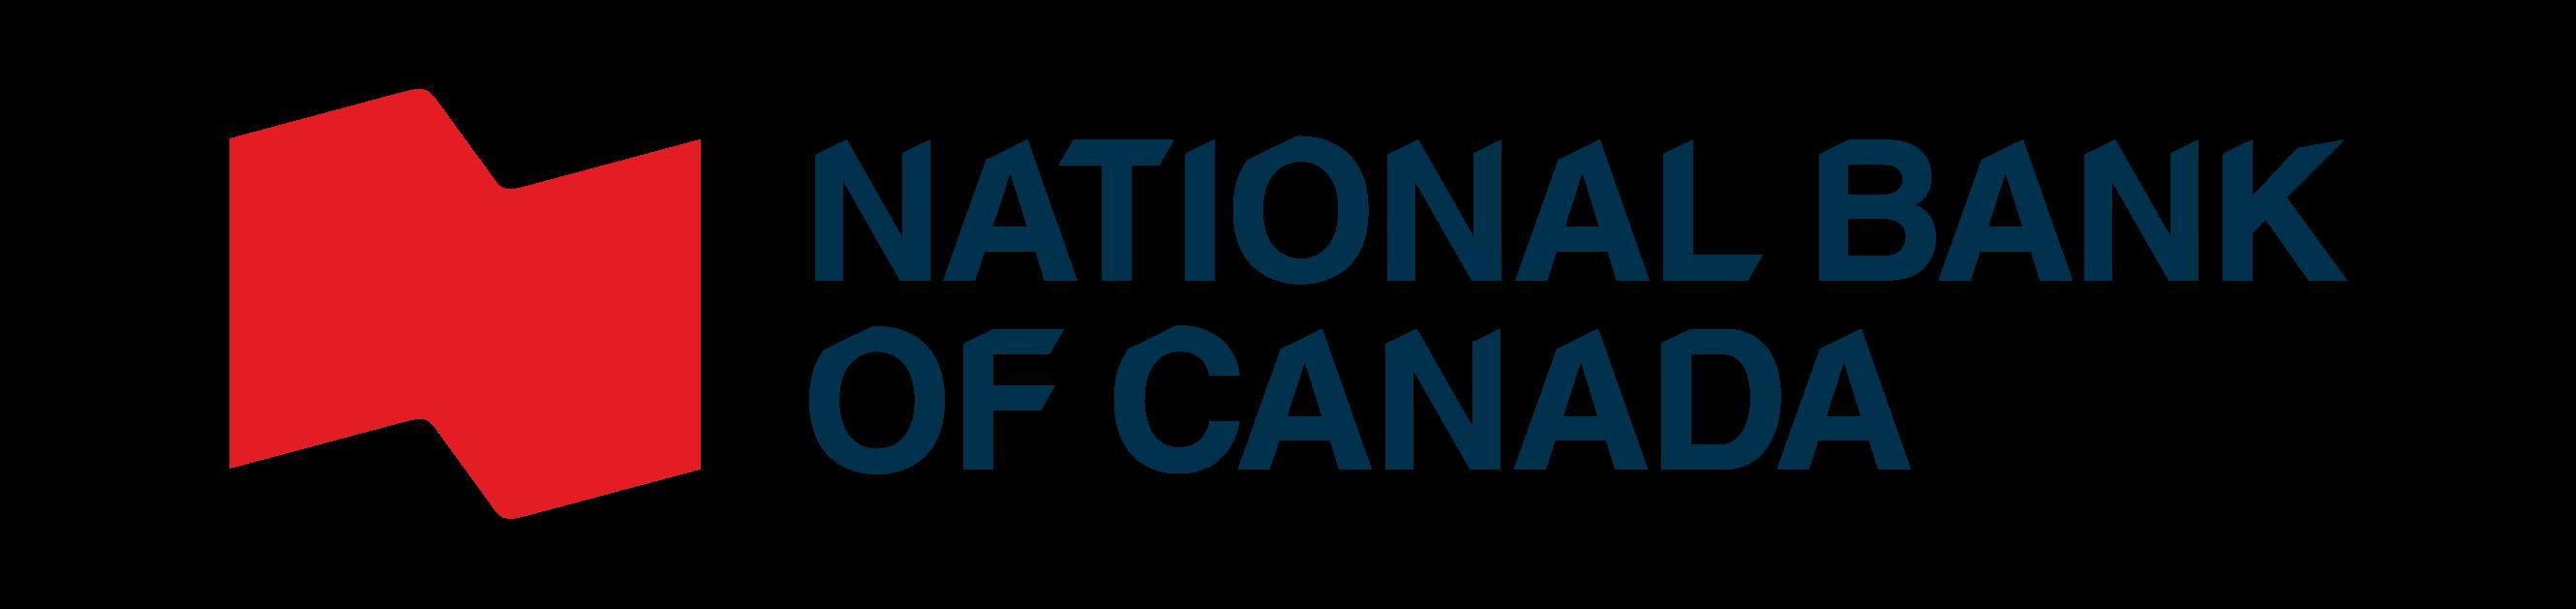 National Bank of Canada logo